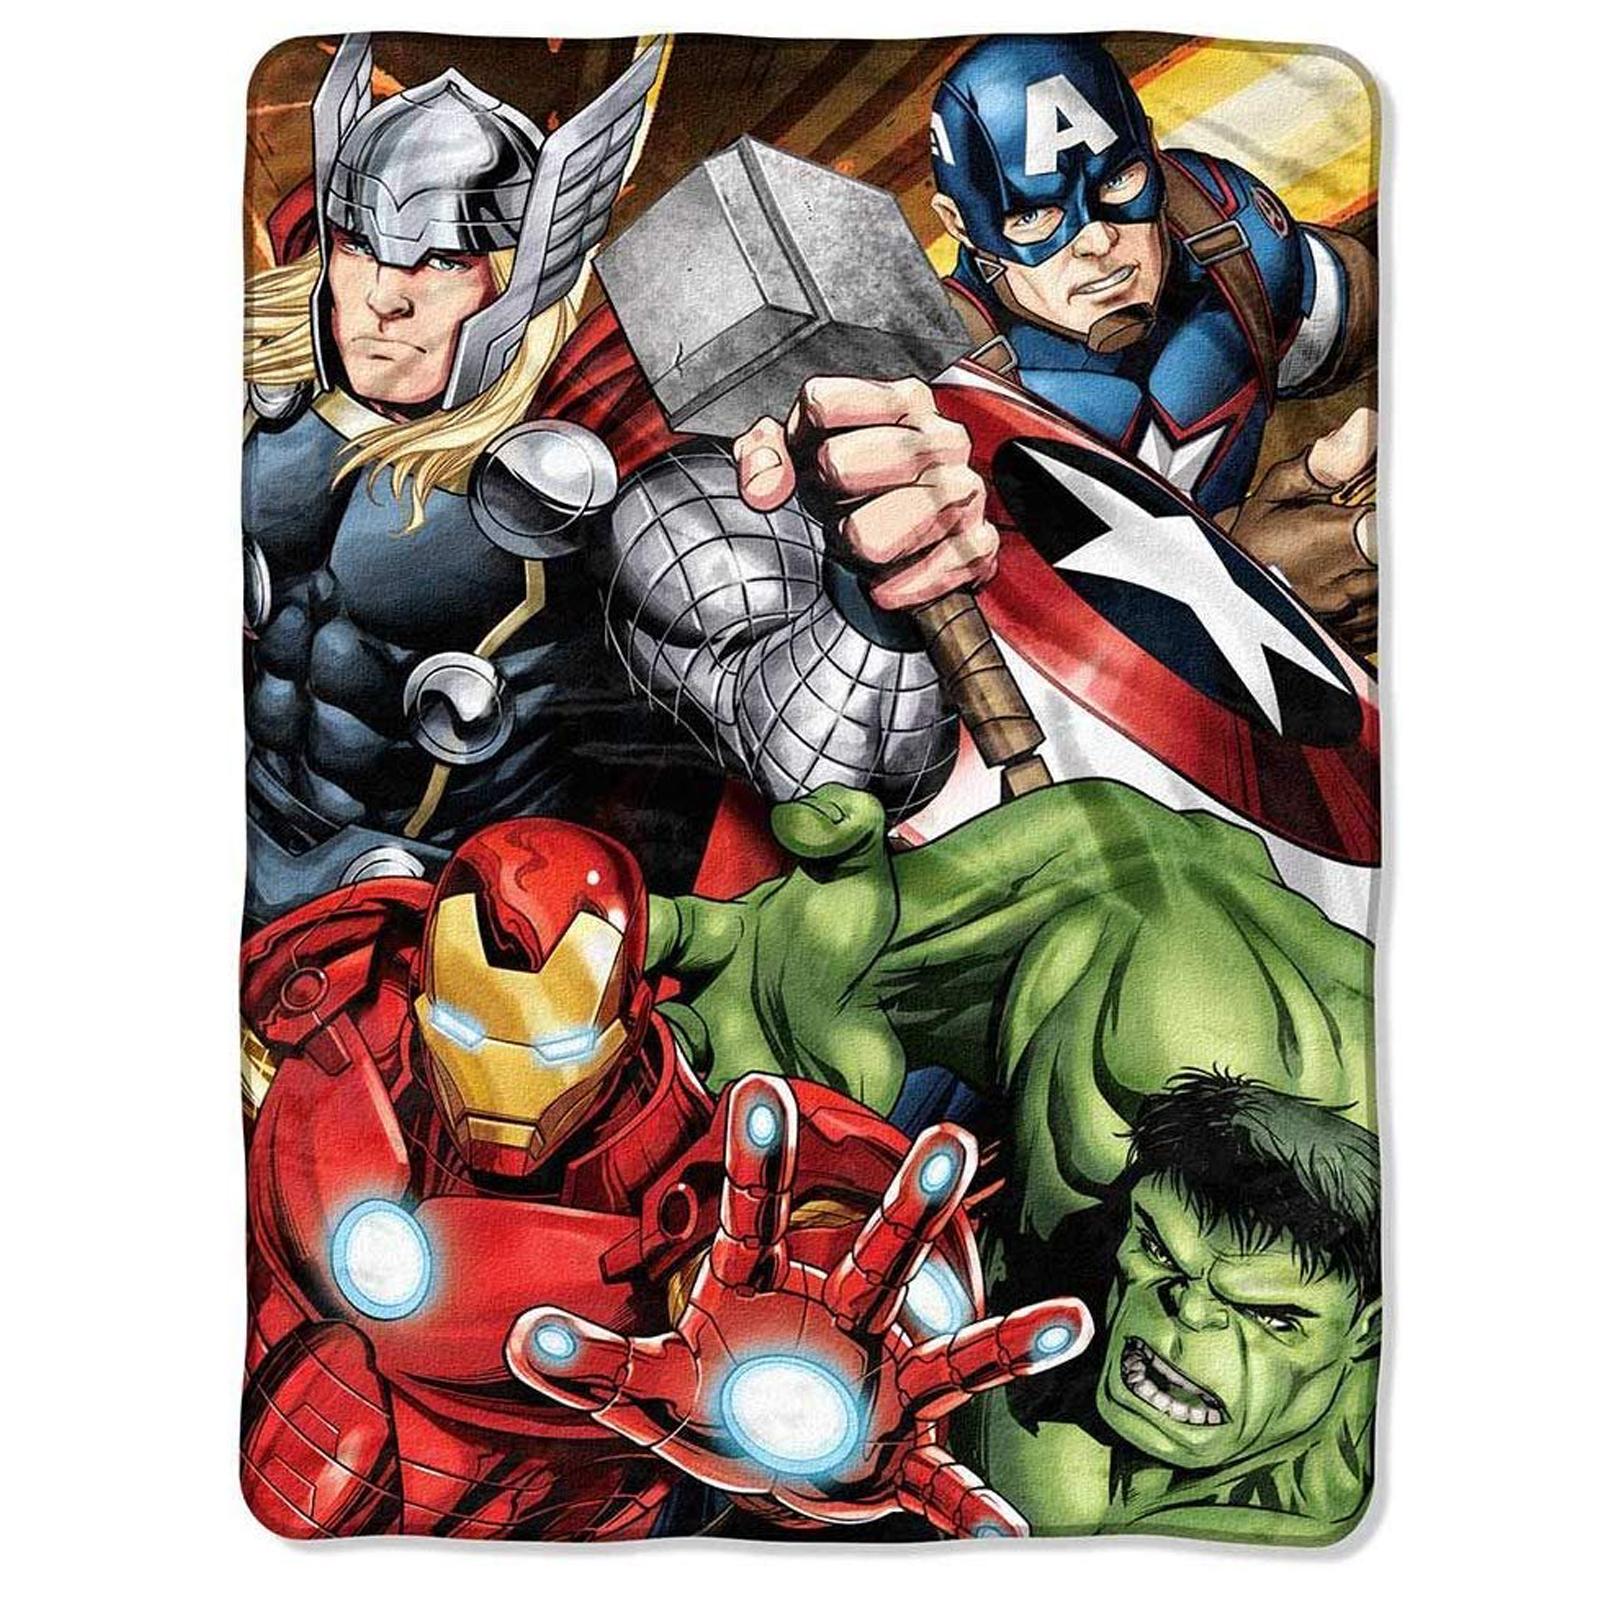 Marvel Four Avengers Soft Throw Blanket 46 x 60 Inch